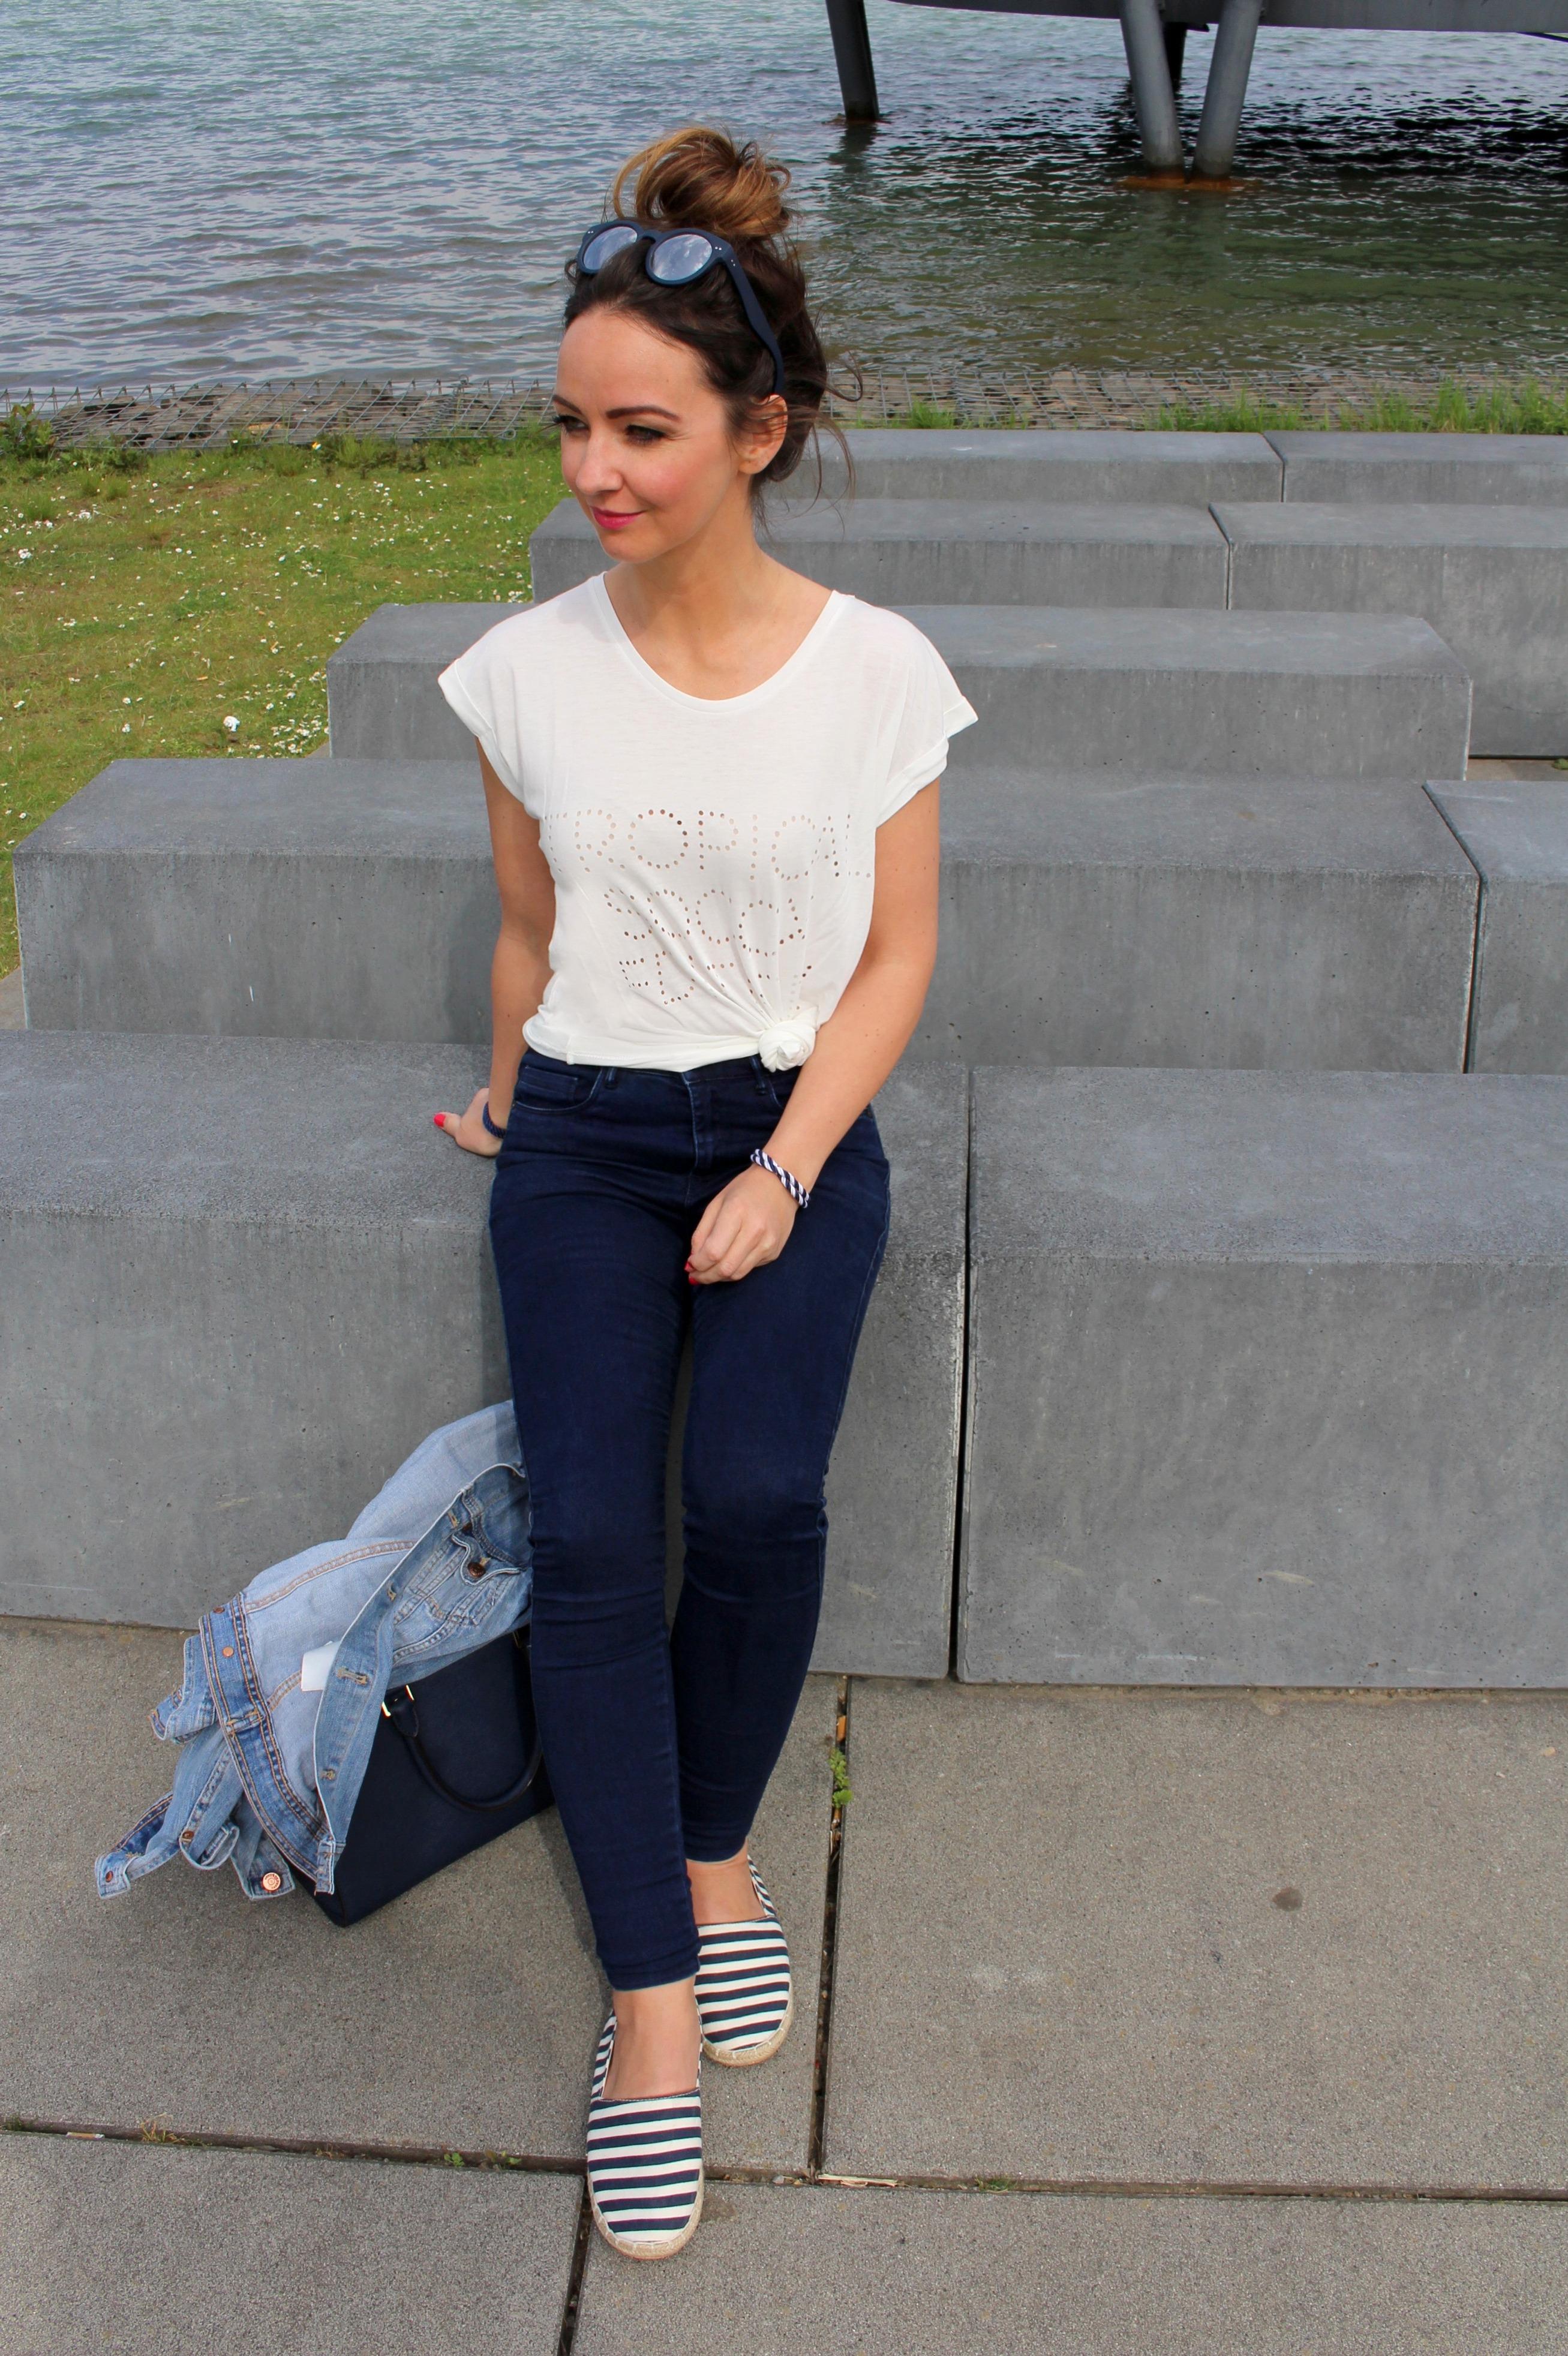 Fashioncircuz by Jenny soccx-kopie-4 MARITIMER SPAZIERGANG